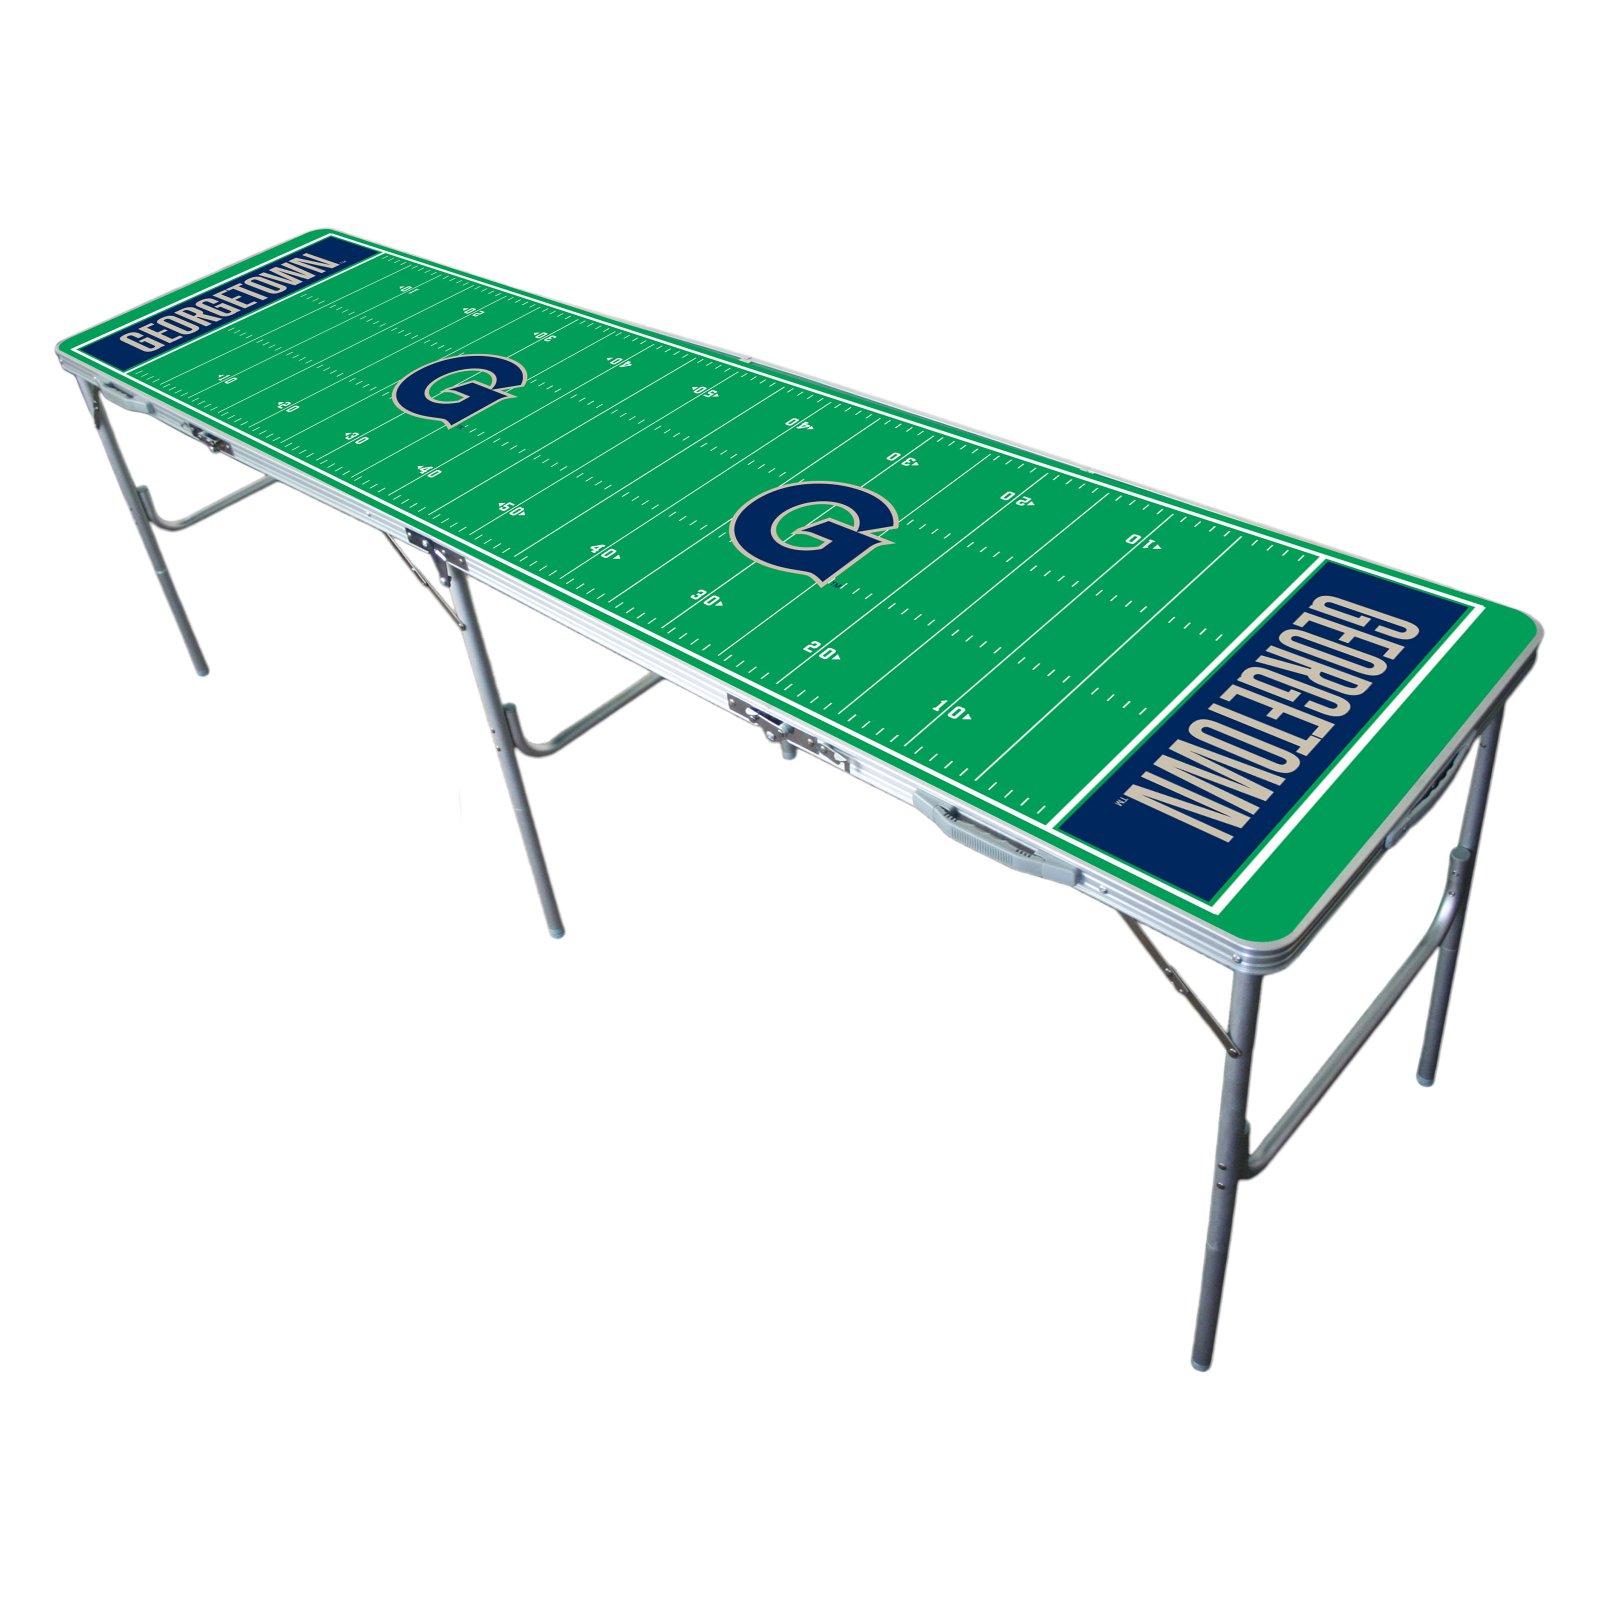 Tailgate Table 2 x 8 NCAA Georgetown